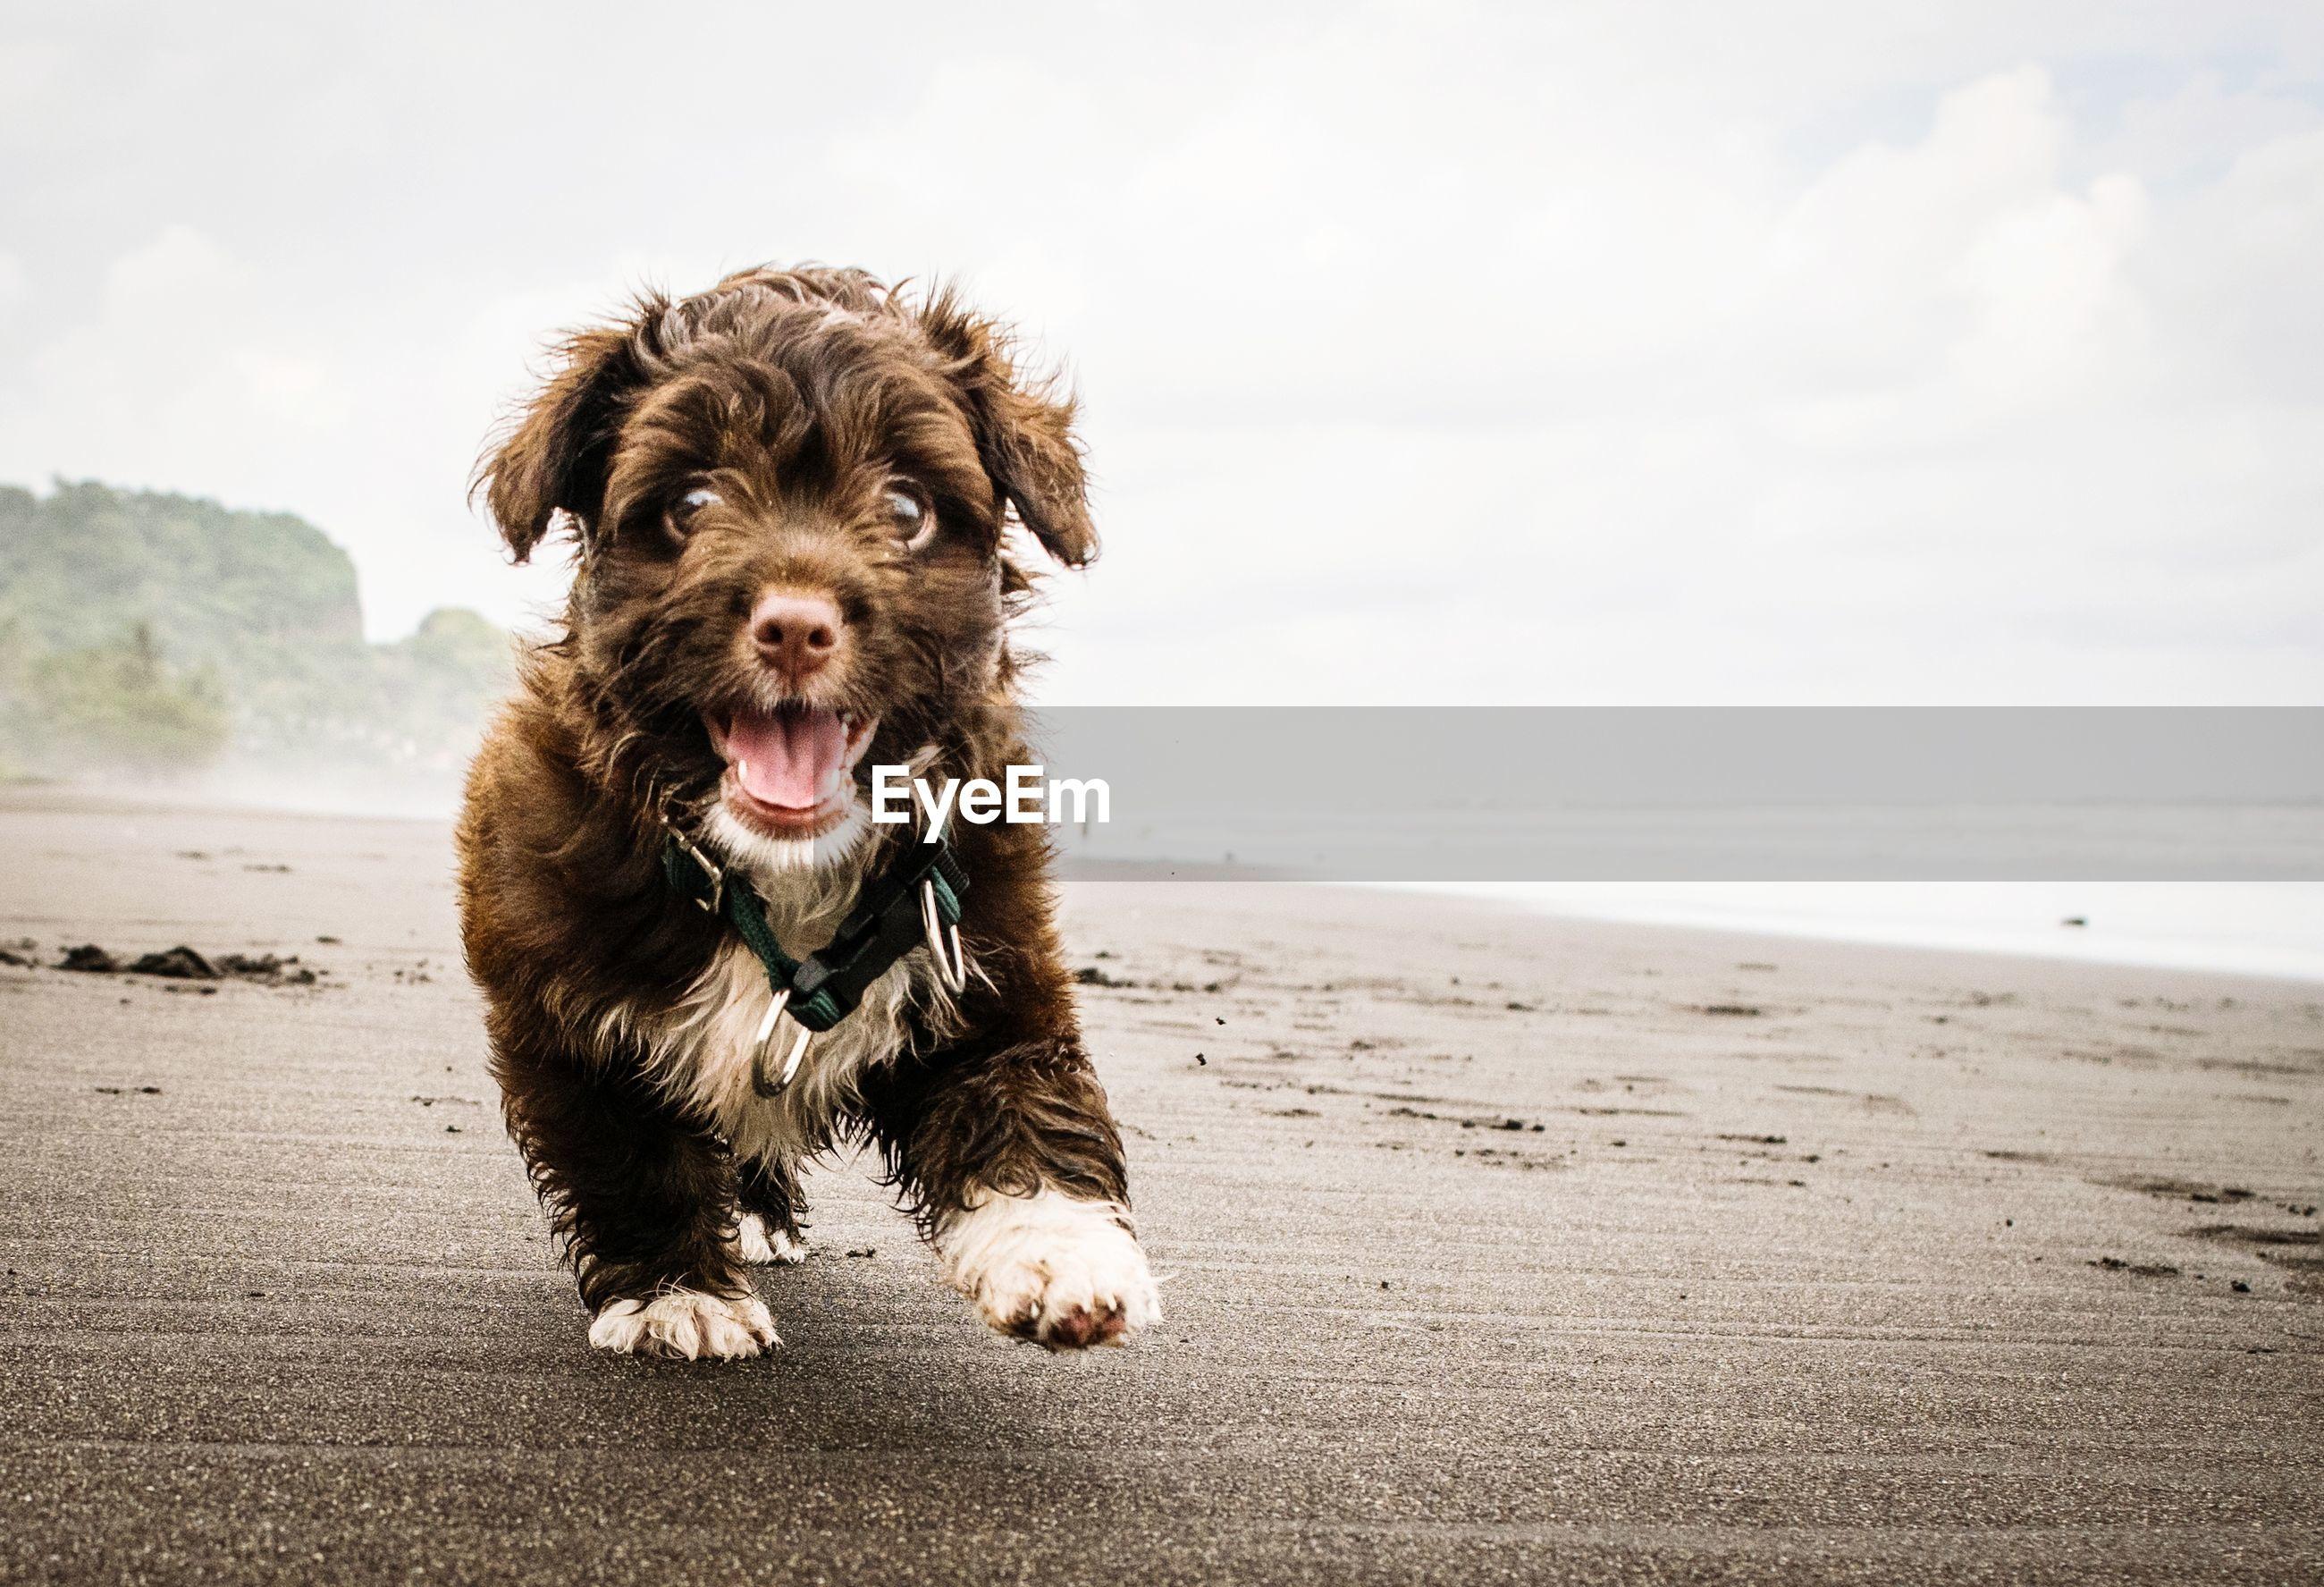 Portrait of dog walking at beach